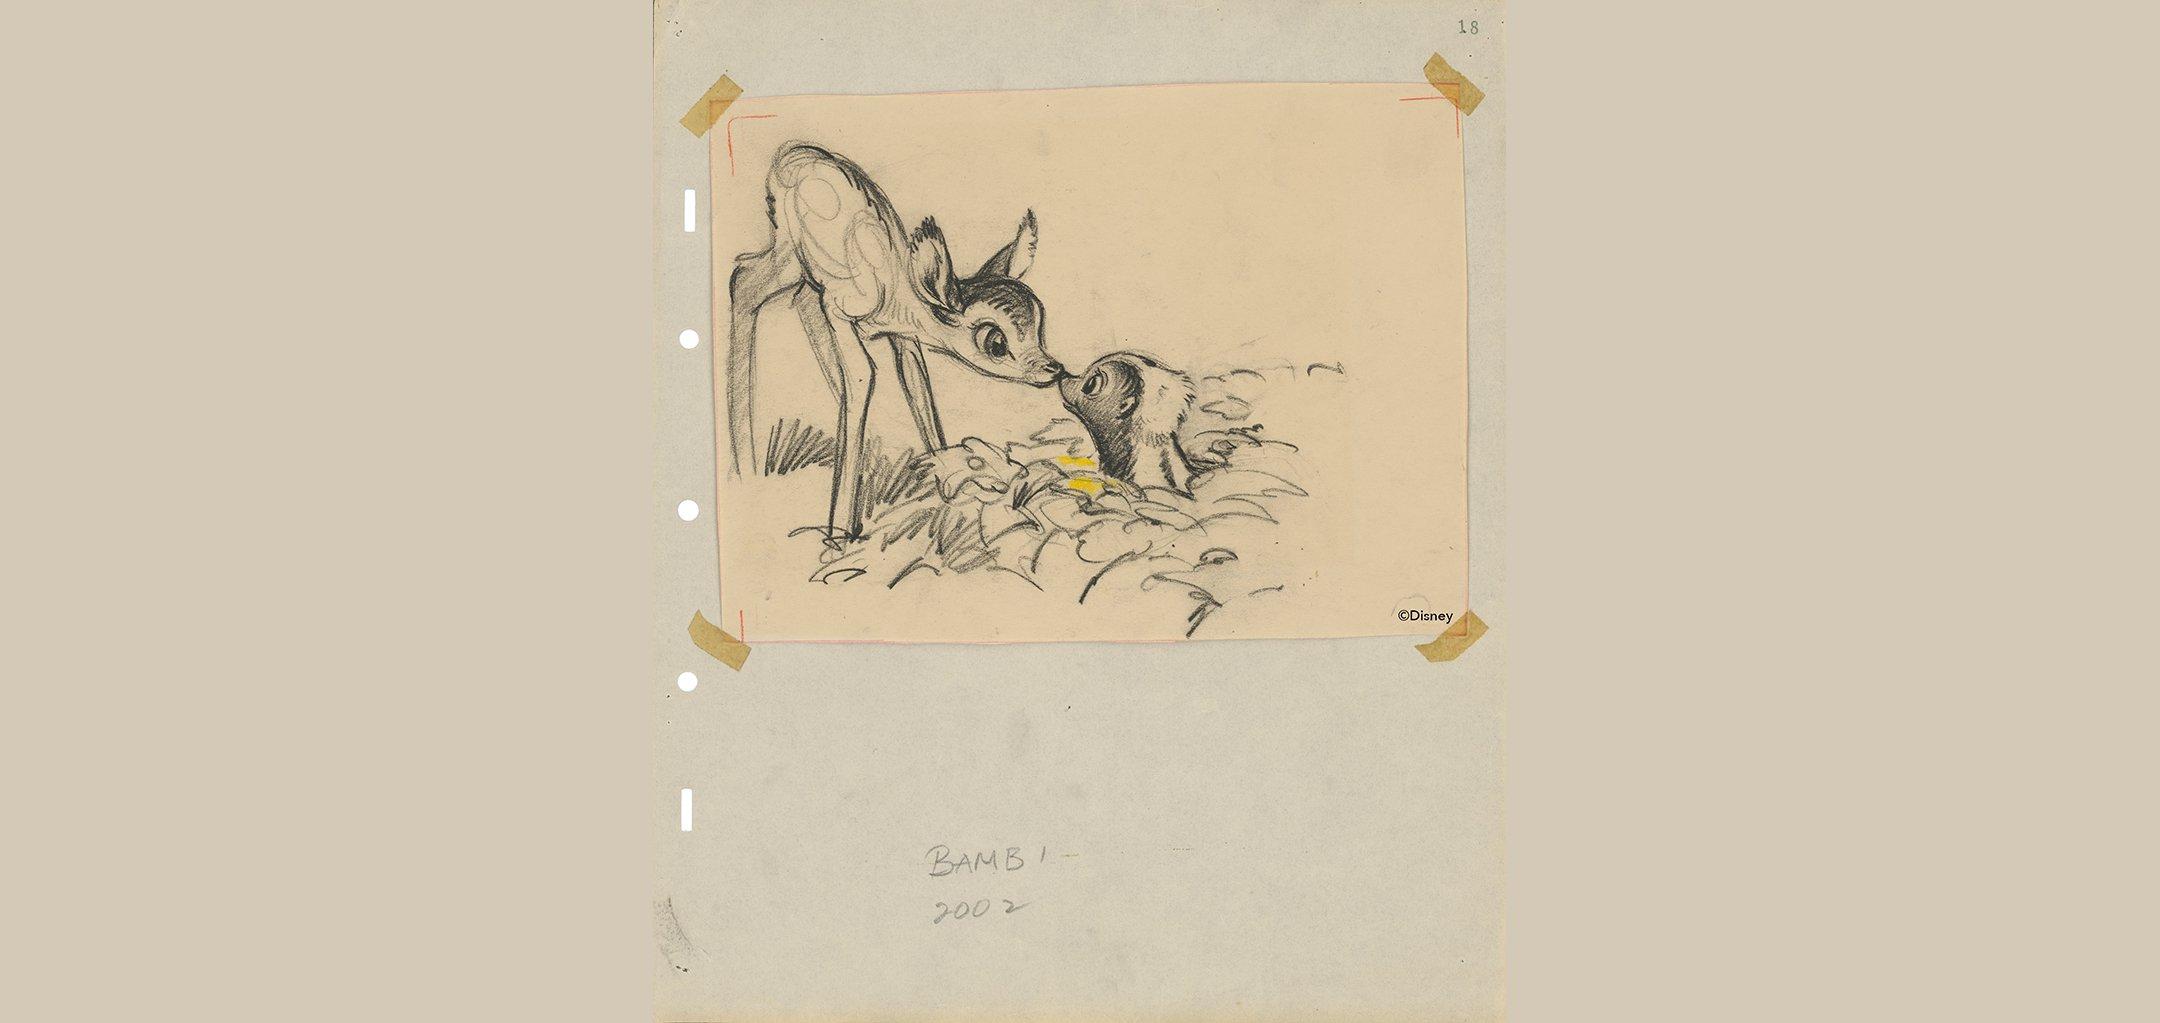 Bambi (1942), Disney Studio Artist, Story Sketch, coloured pencil and graphite on paper. © Disney